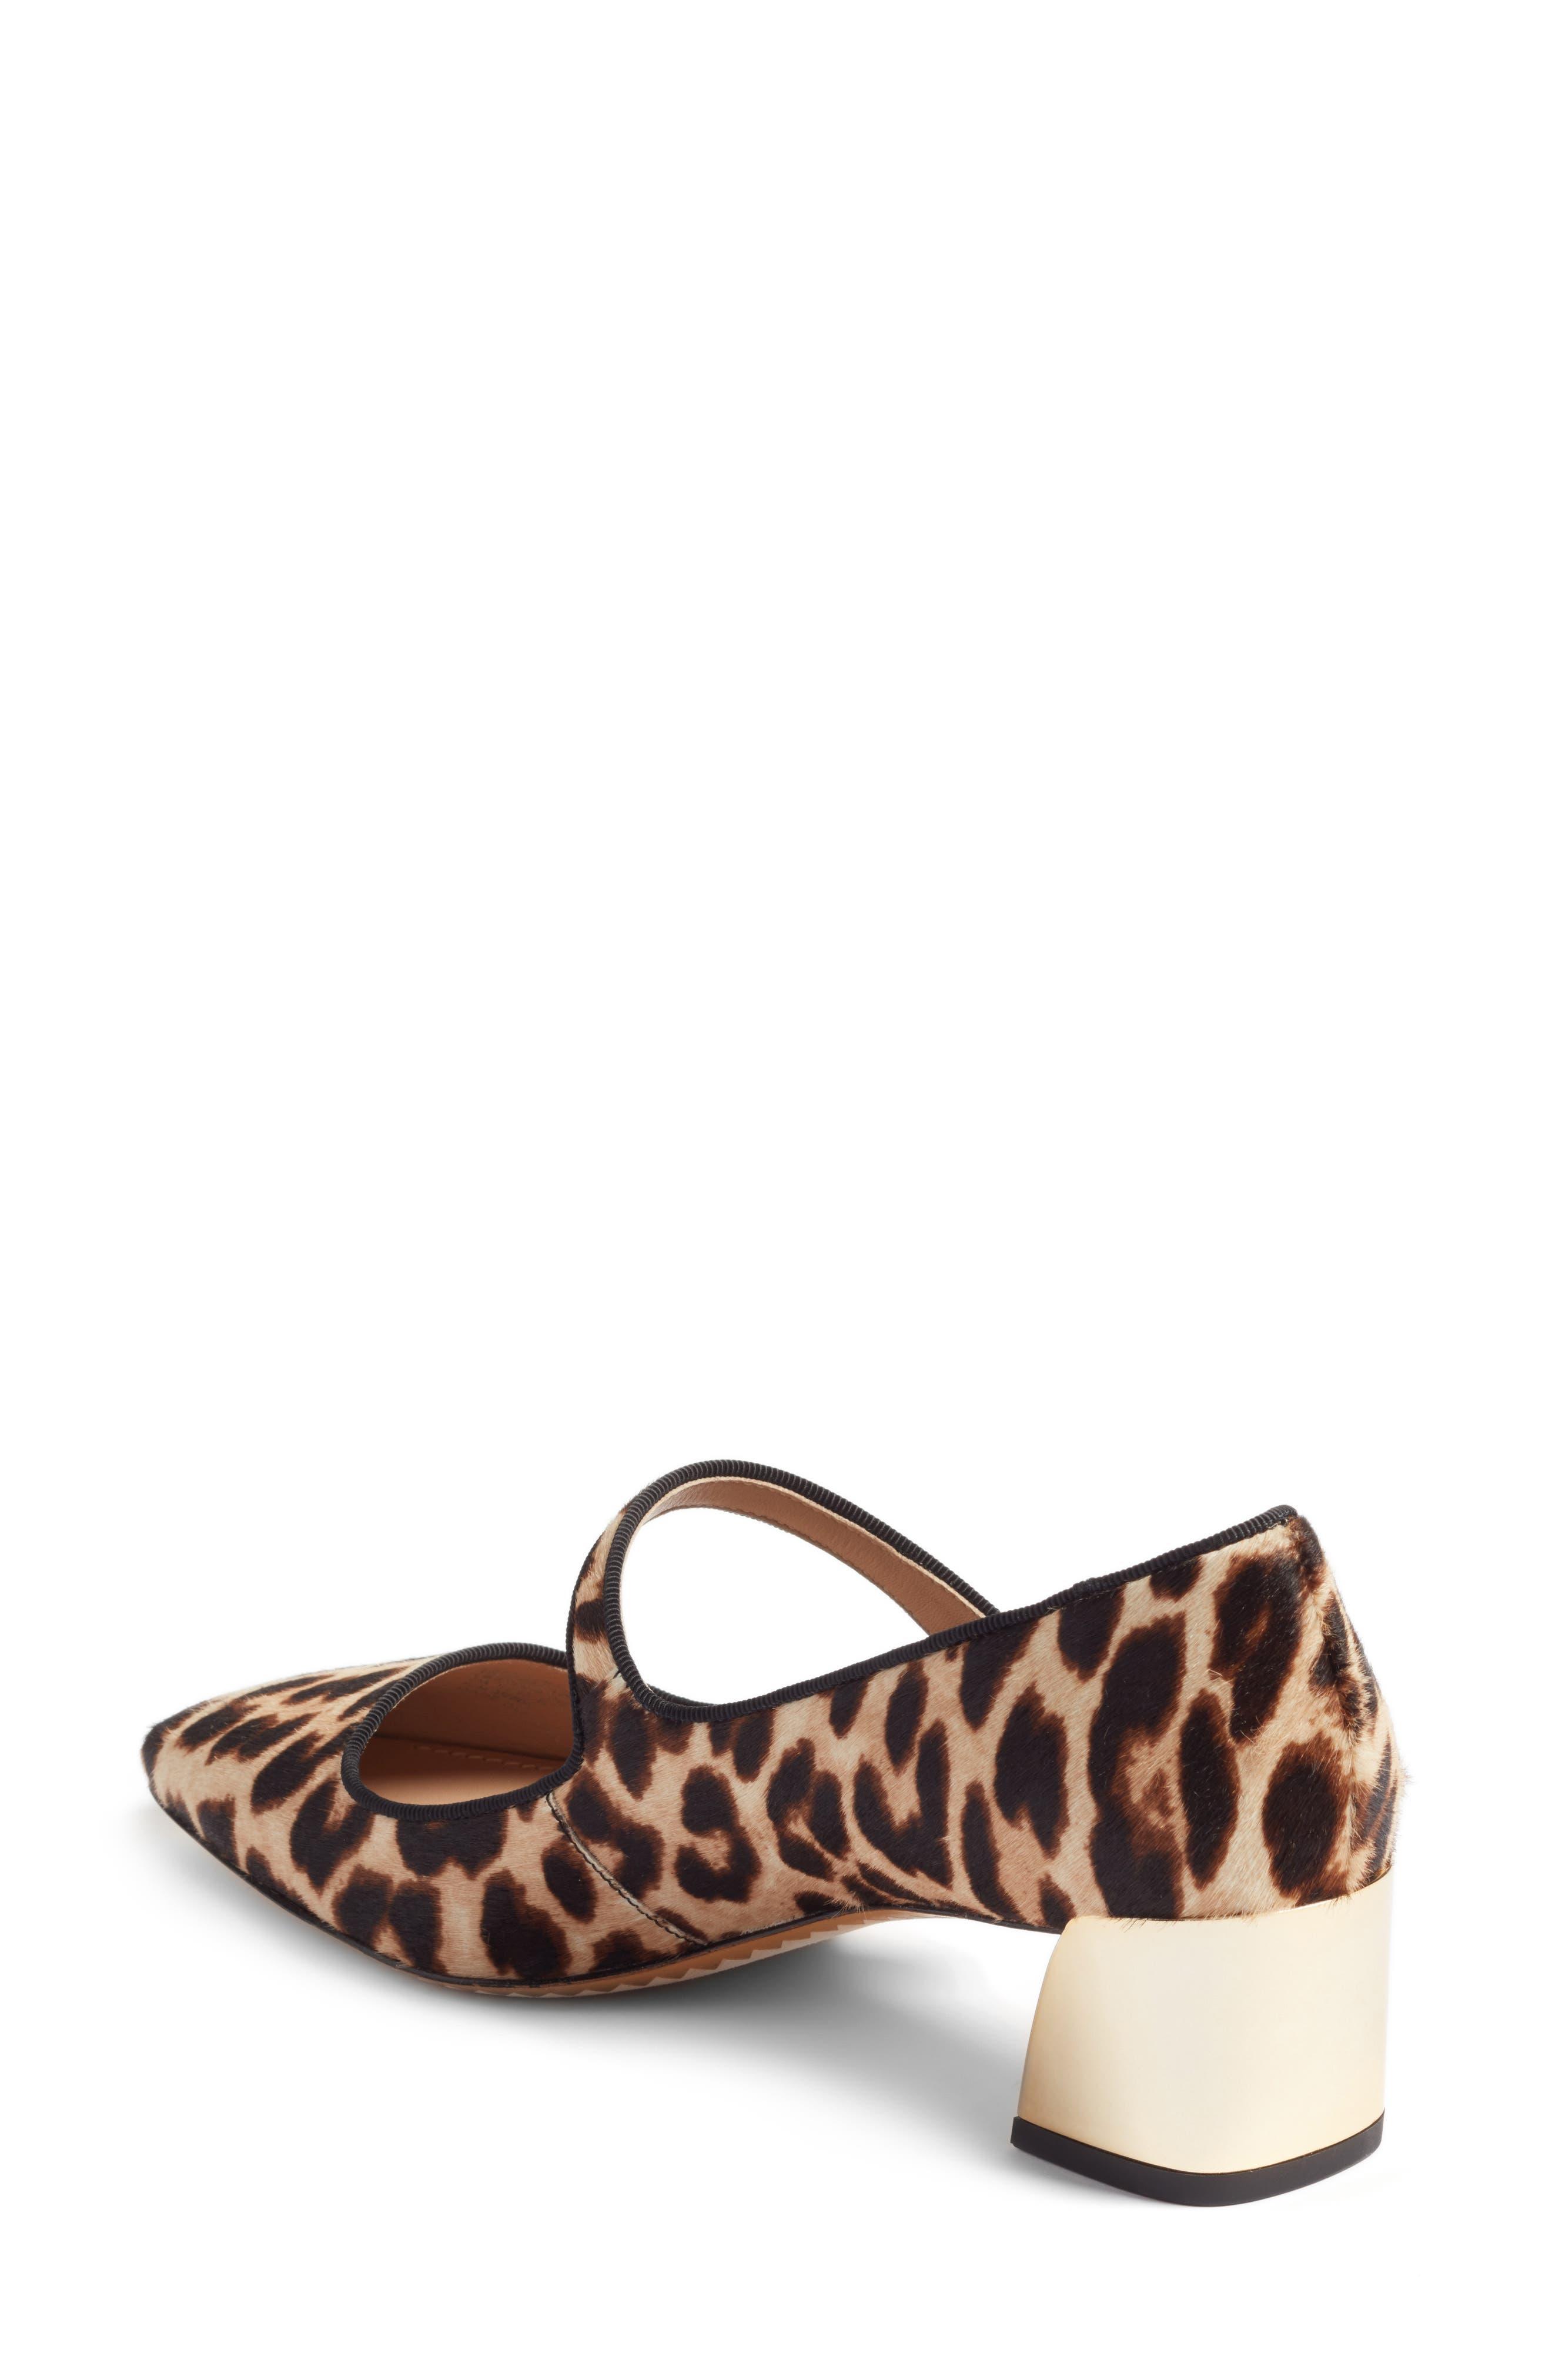 Marisa Genuine Calf Hair Mary Jane Pump,                             Alternate thumbnail 2, color,                             Natural Leopard/ Black